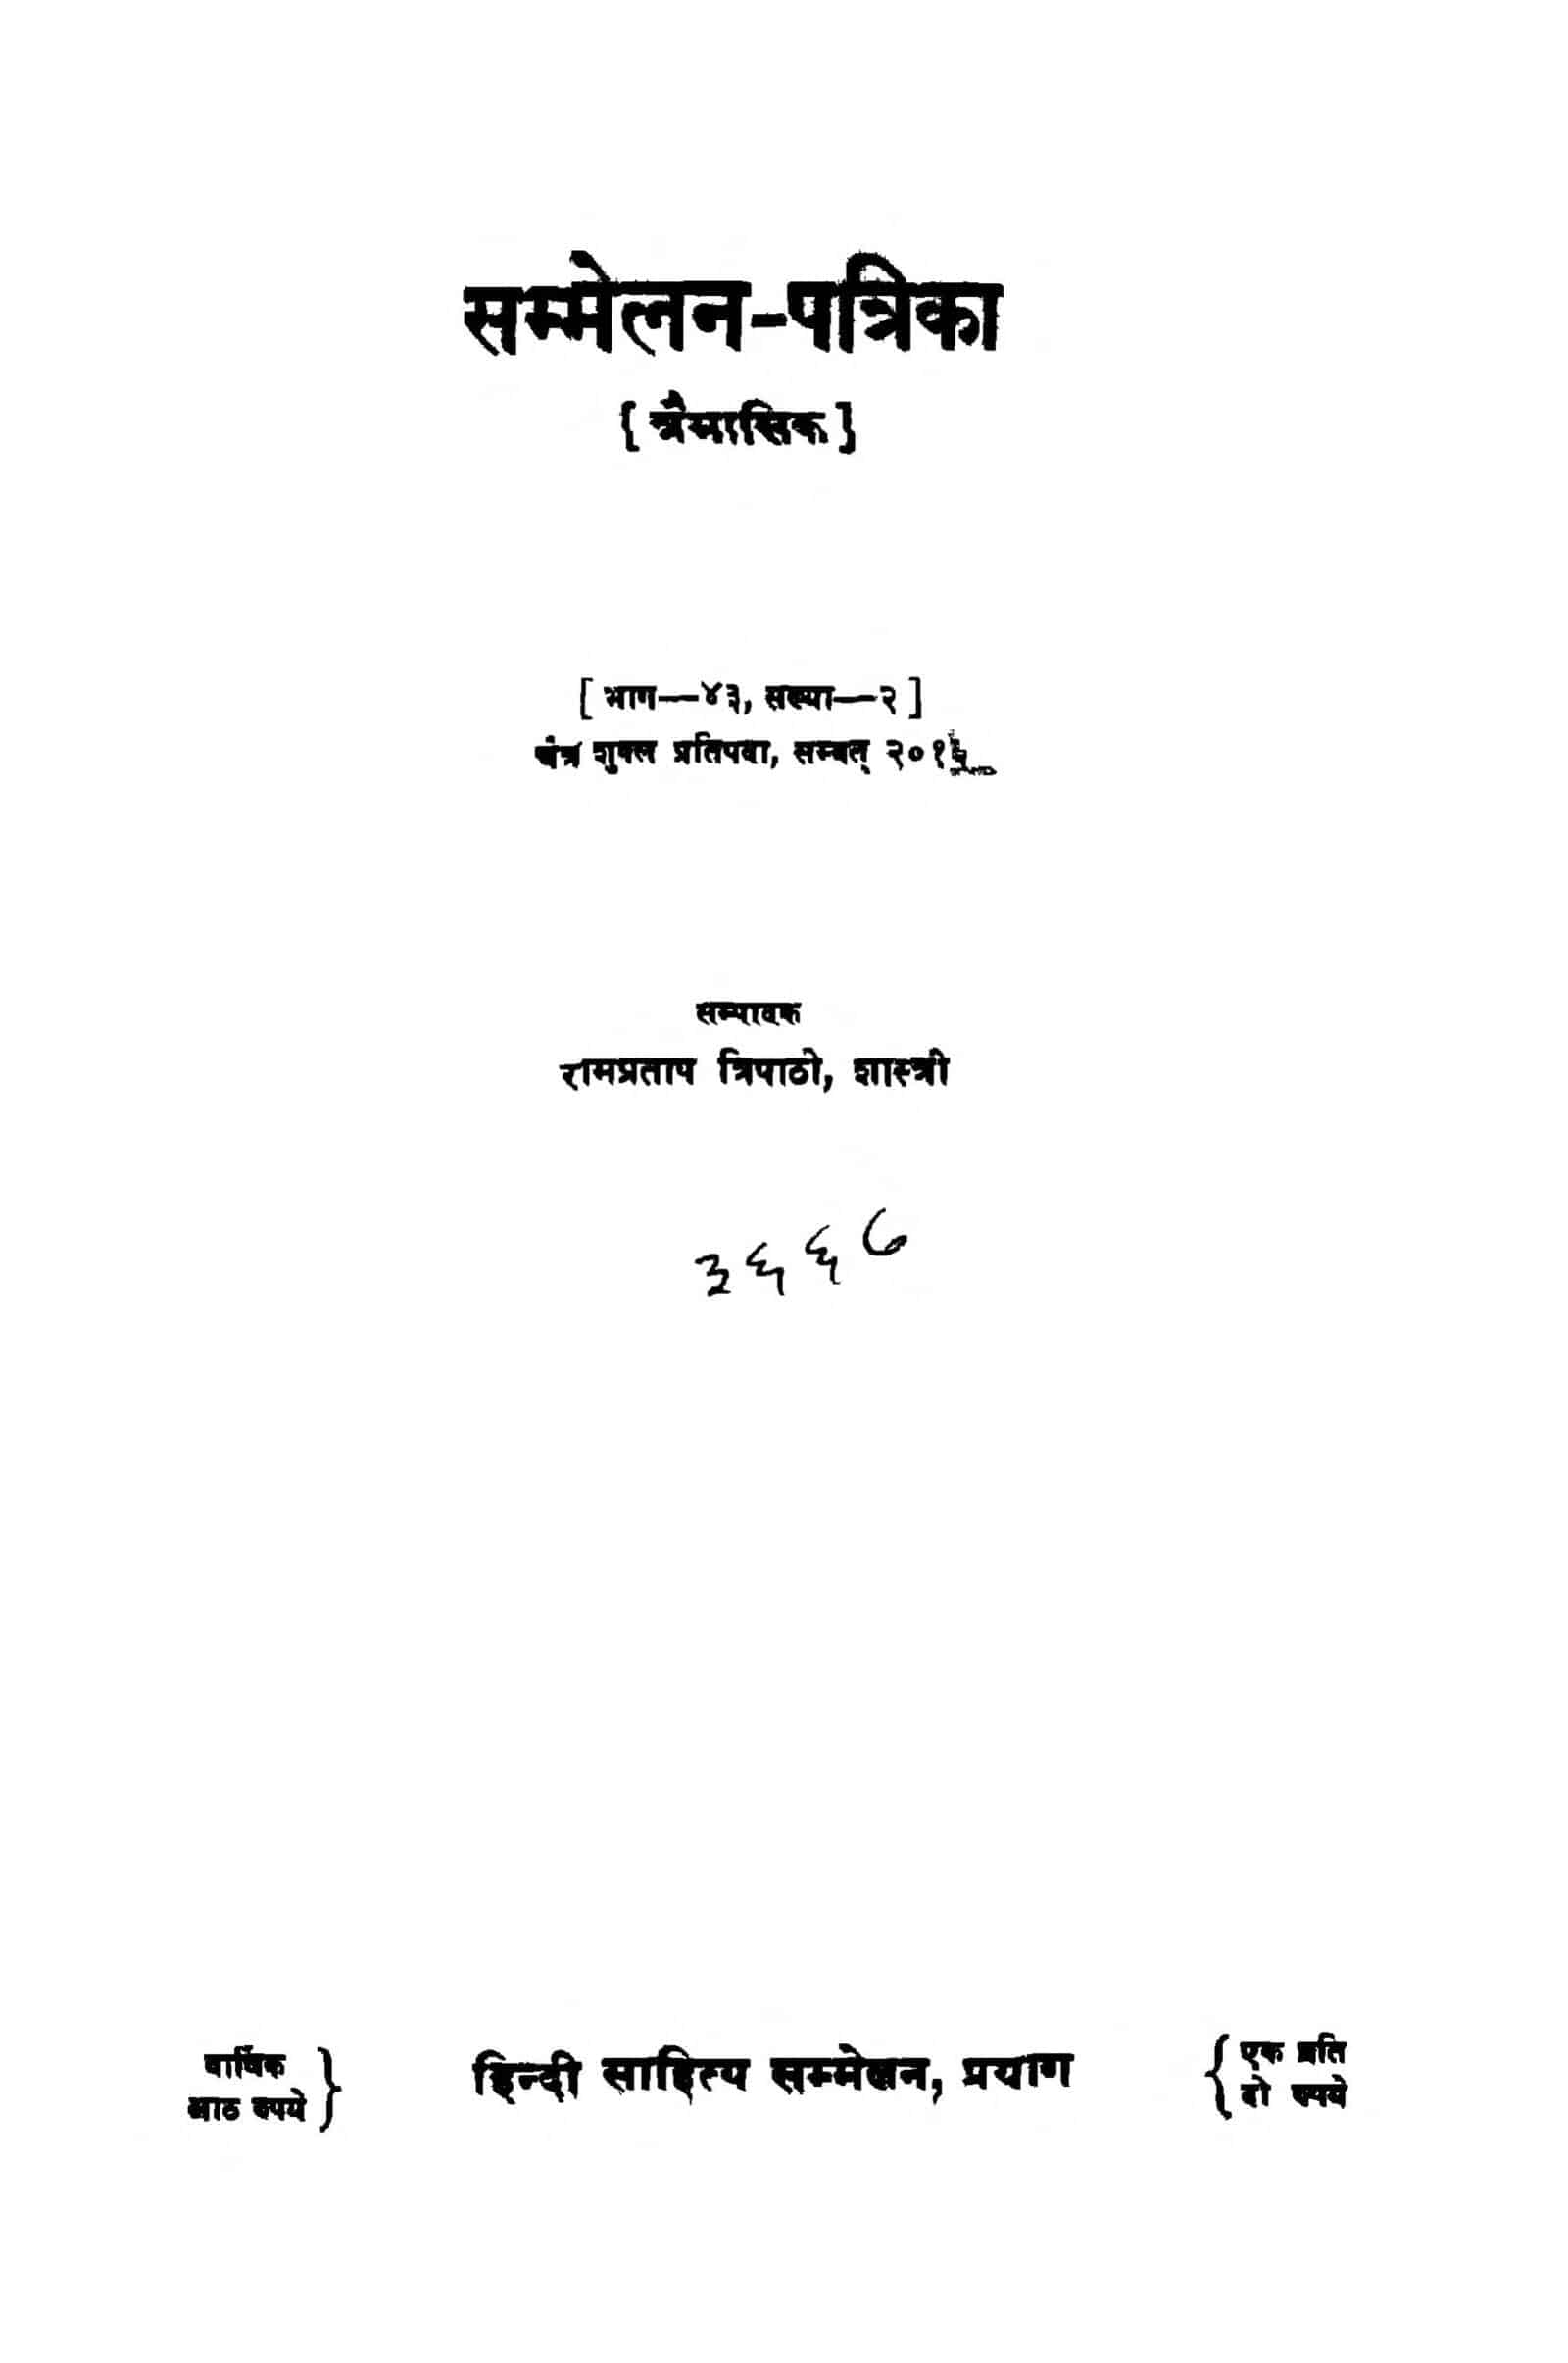 Sammelan Patrika by श्री. रामप्रताप त्रिपाठी शास्त्री - Shree Rampratap Tripati Shastri